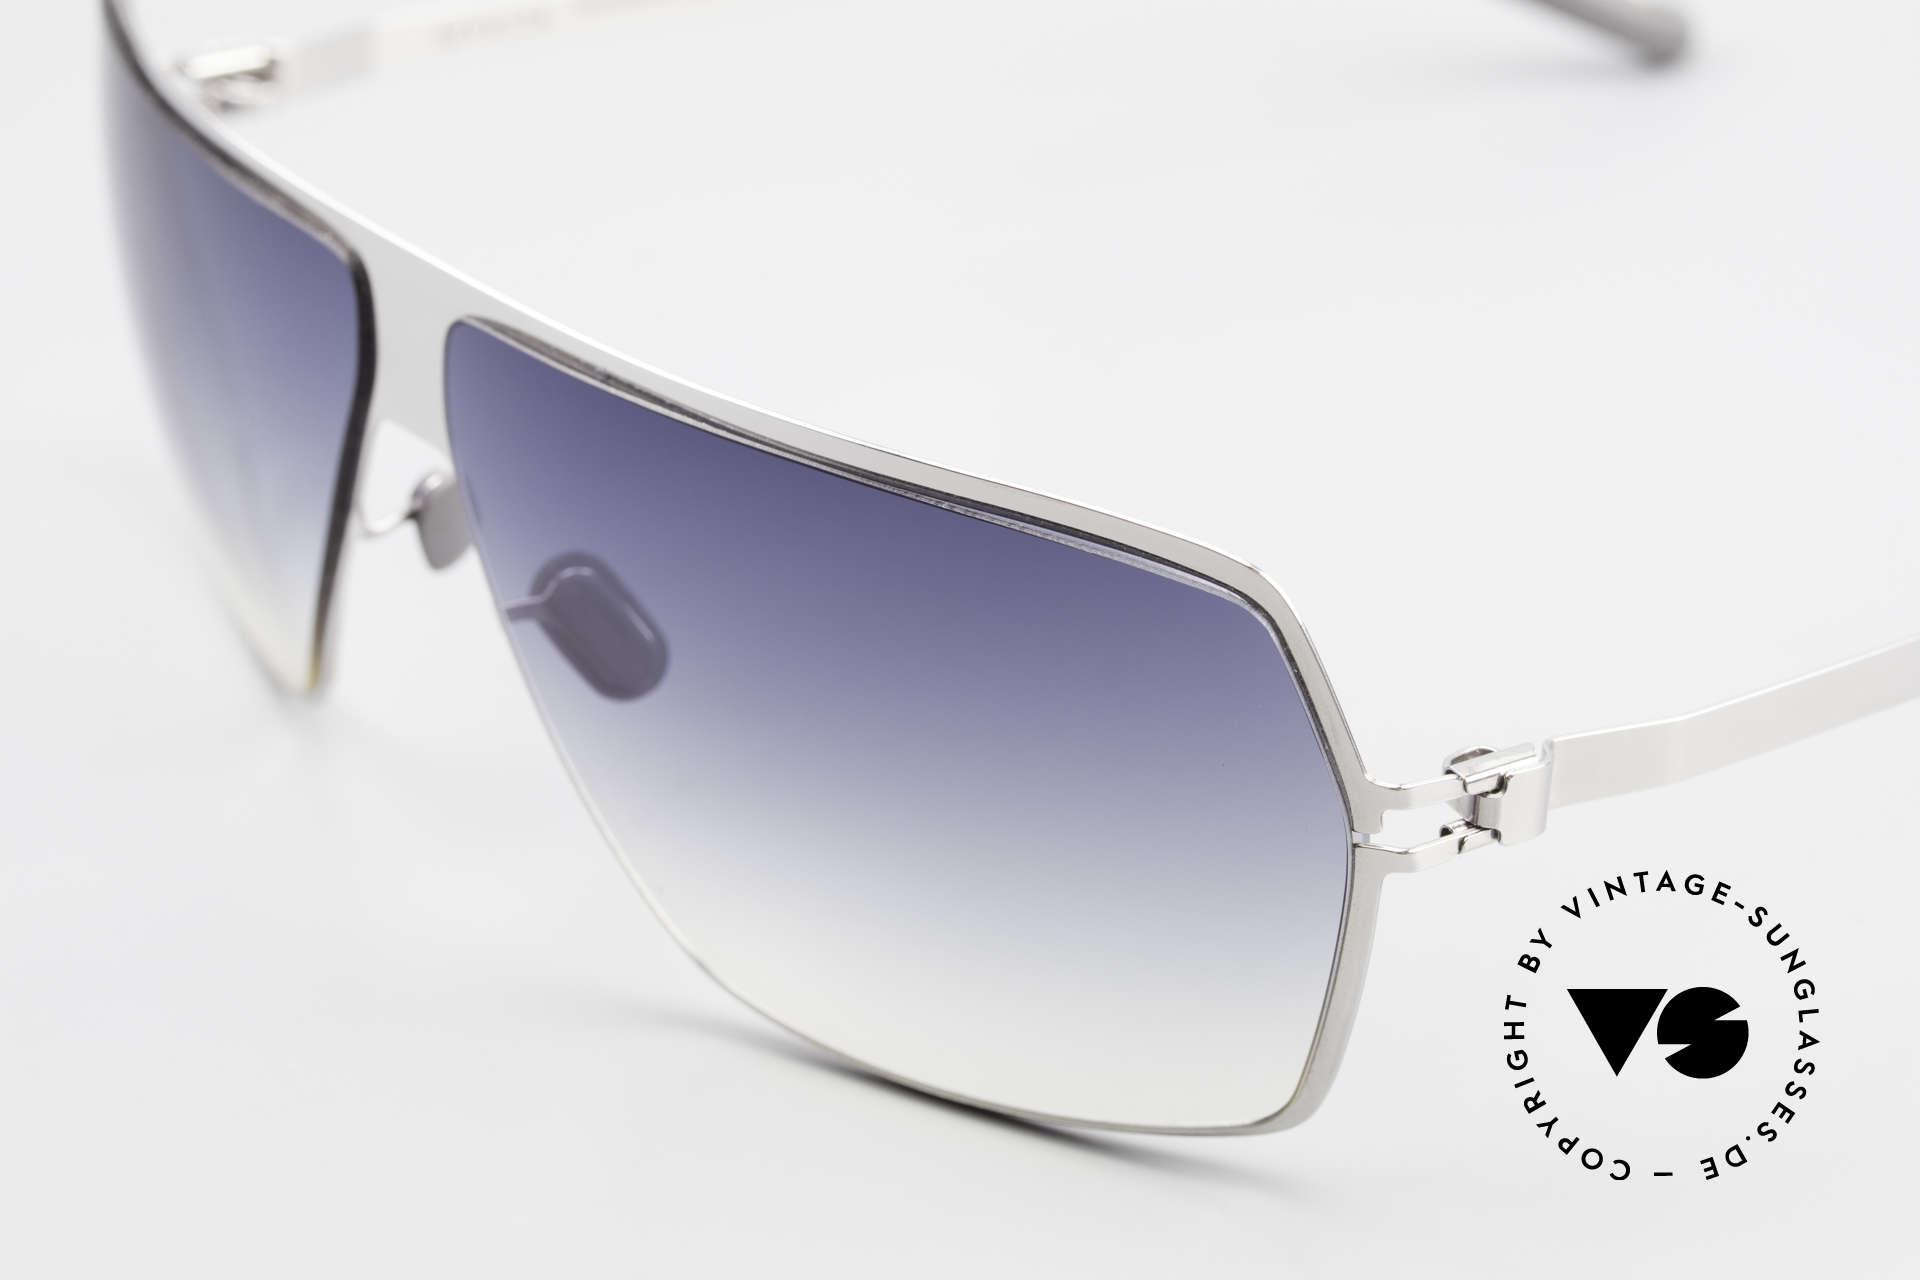 Mykita Rock No1 Designer Sunglasses 2009, flexible metal frame = innovative and elegant likewise, Made for Men